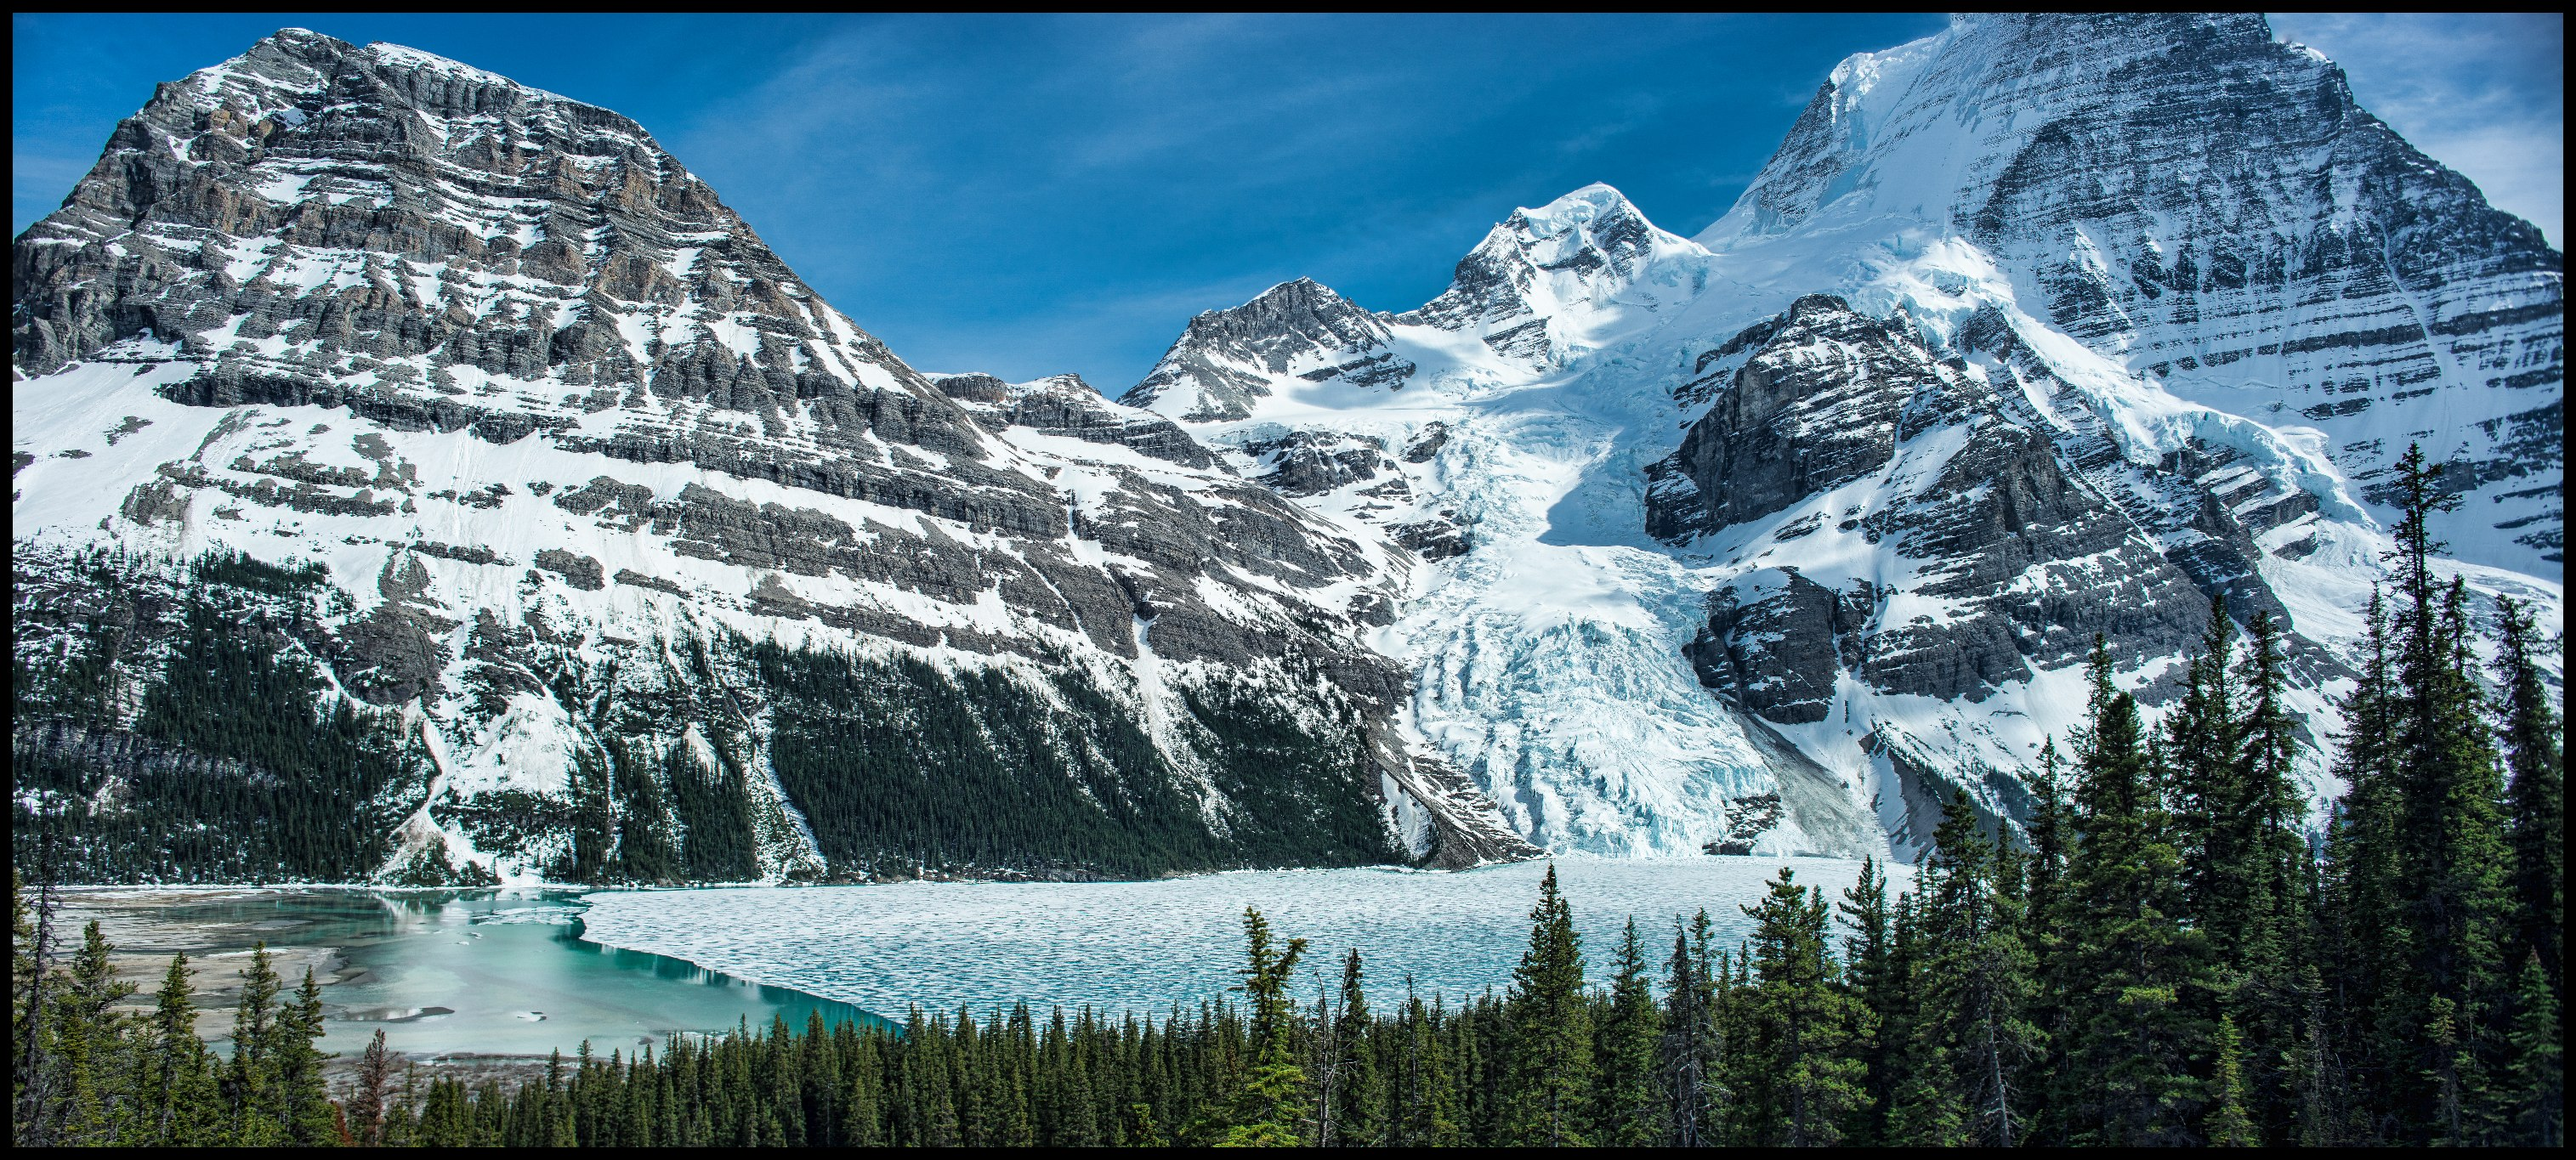 Stunning panorama view from Toboggan Falls at semi frozen Berg Lake Sony A7 / Canon FD Tilt Shift 35 2.8